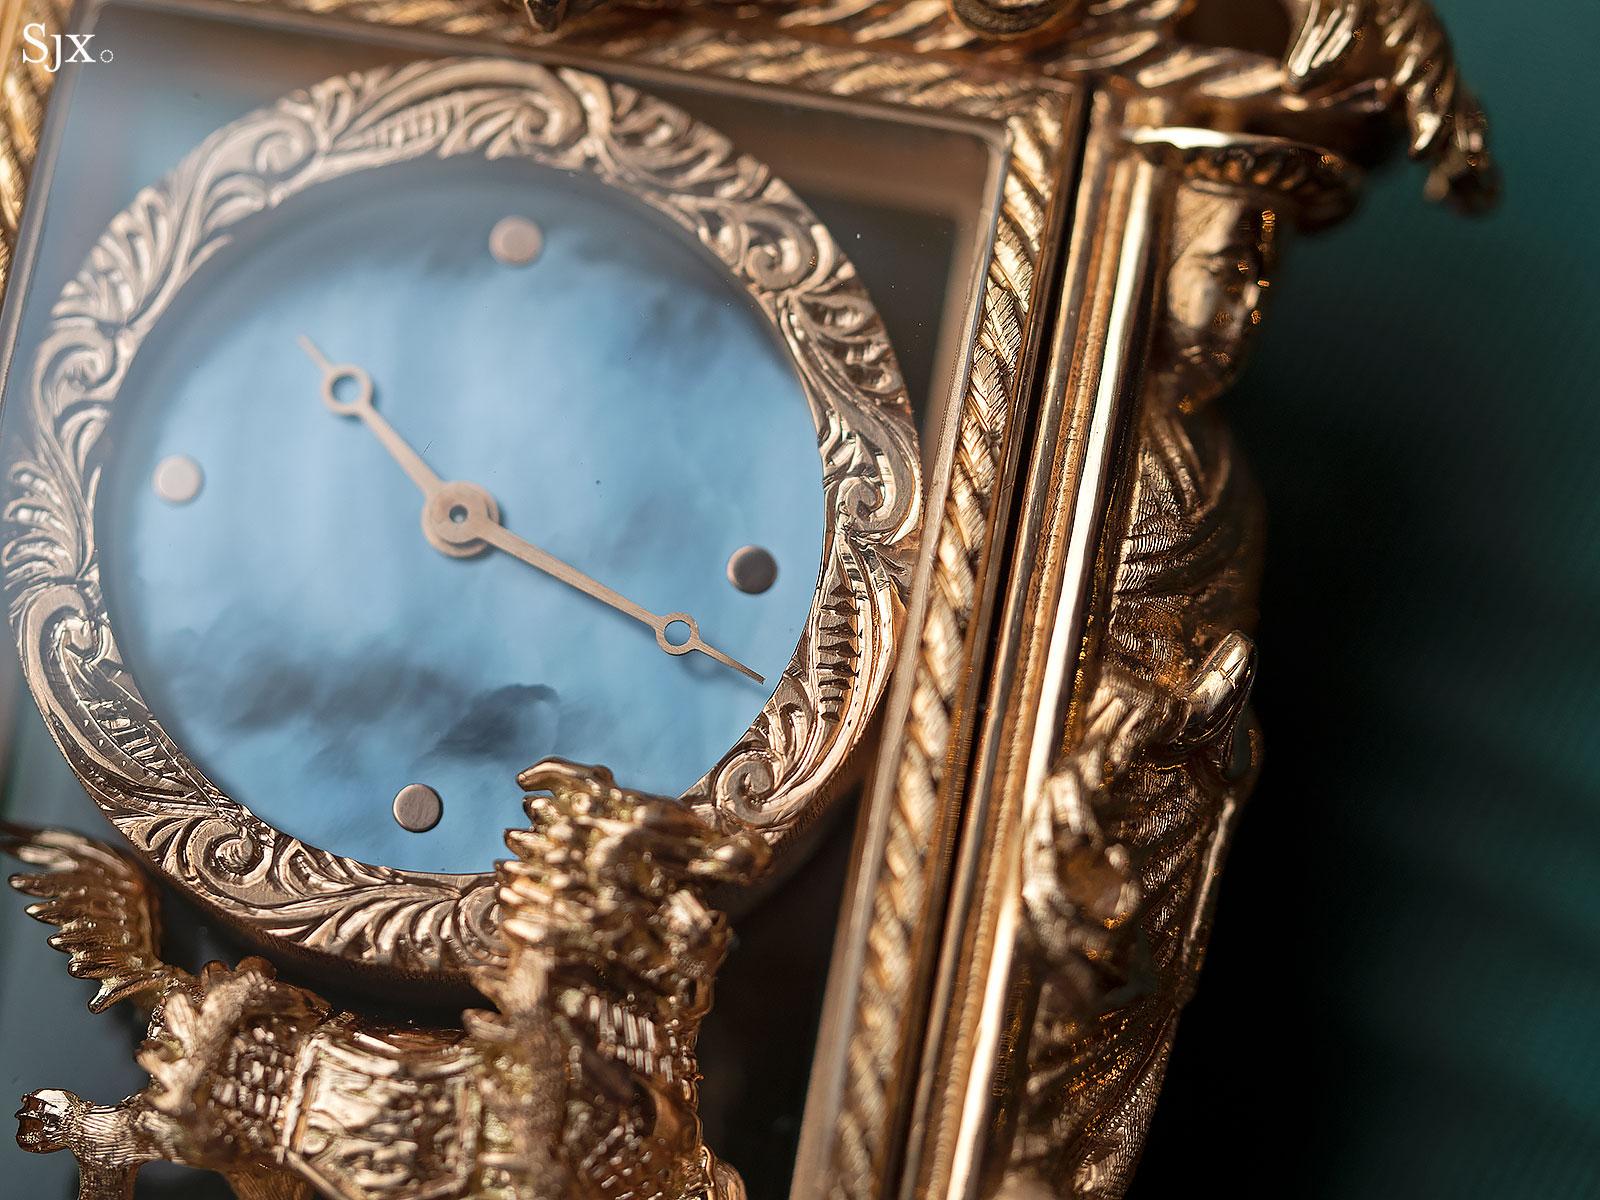 Dolce Gabbana Alta Orologeria Qilin watch 4